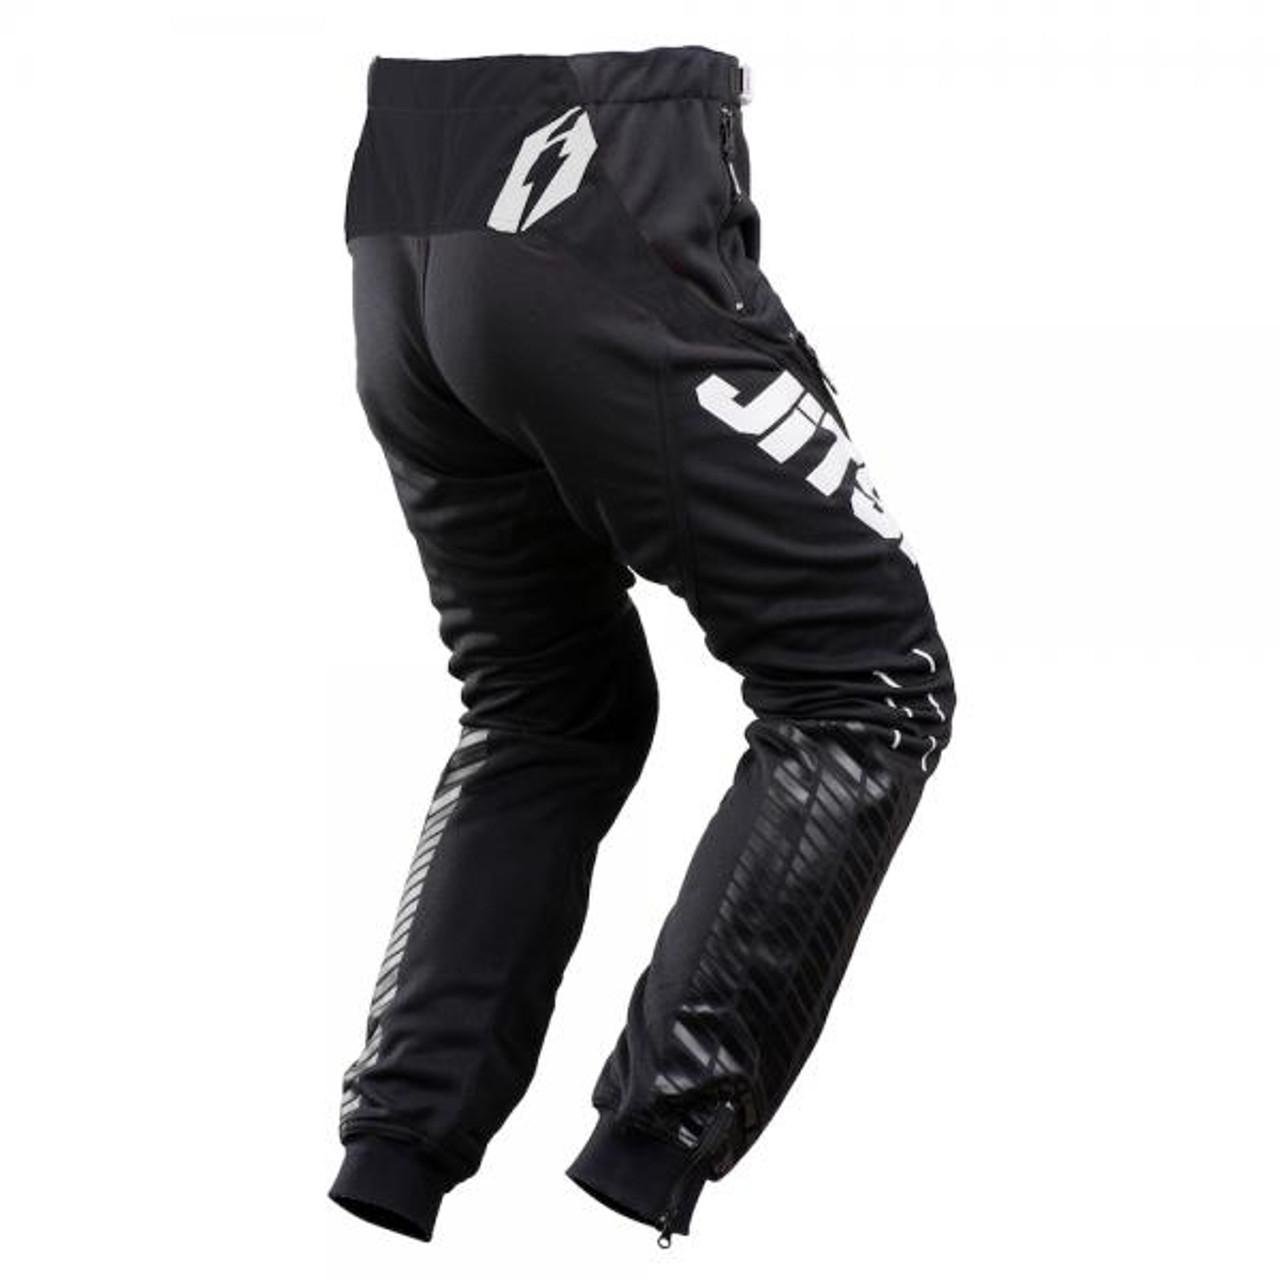 Pants 01 Omnia Solid, black/white